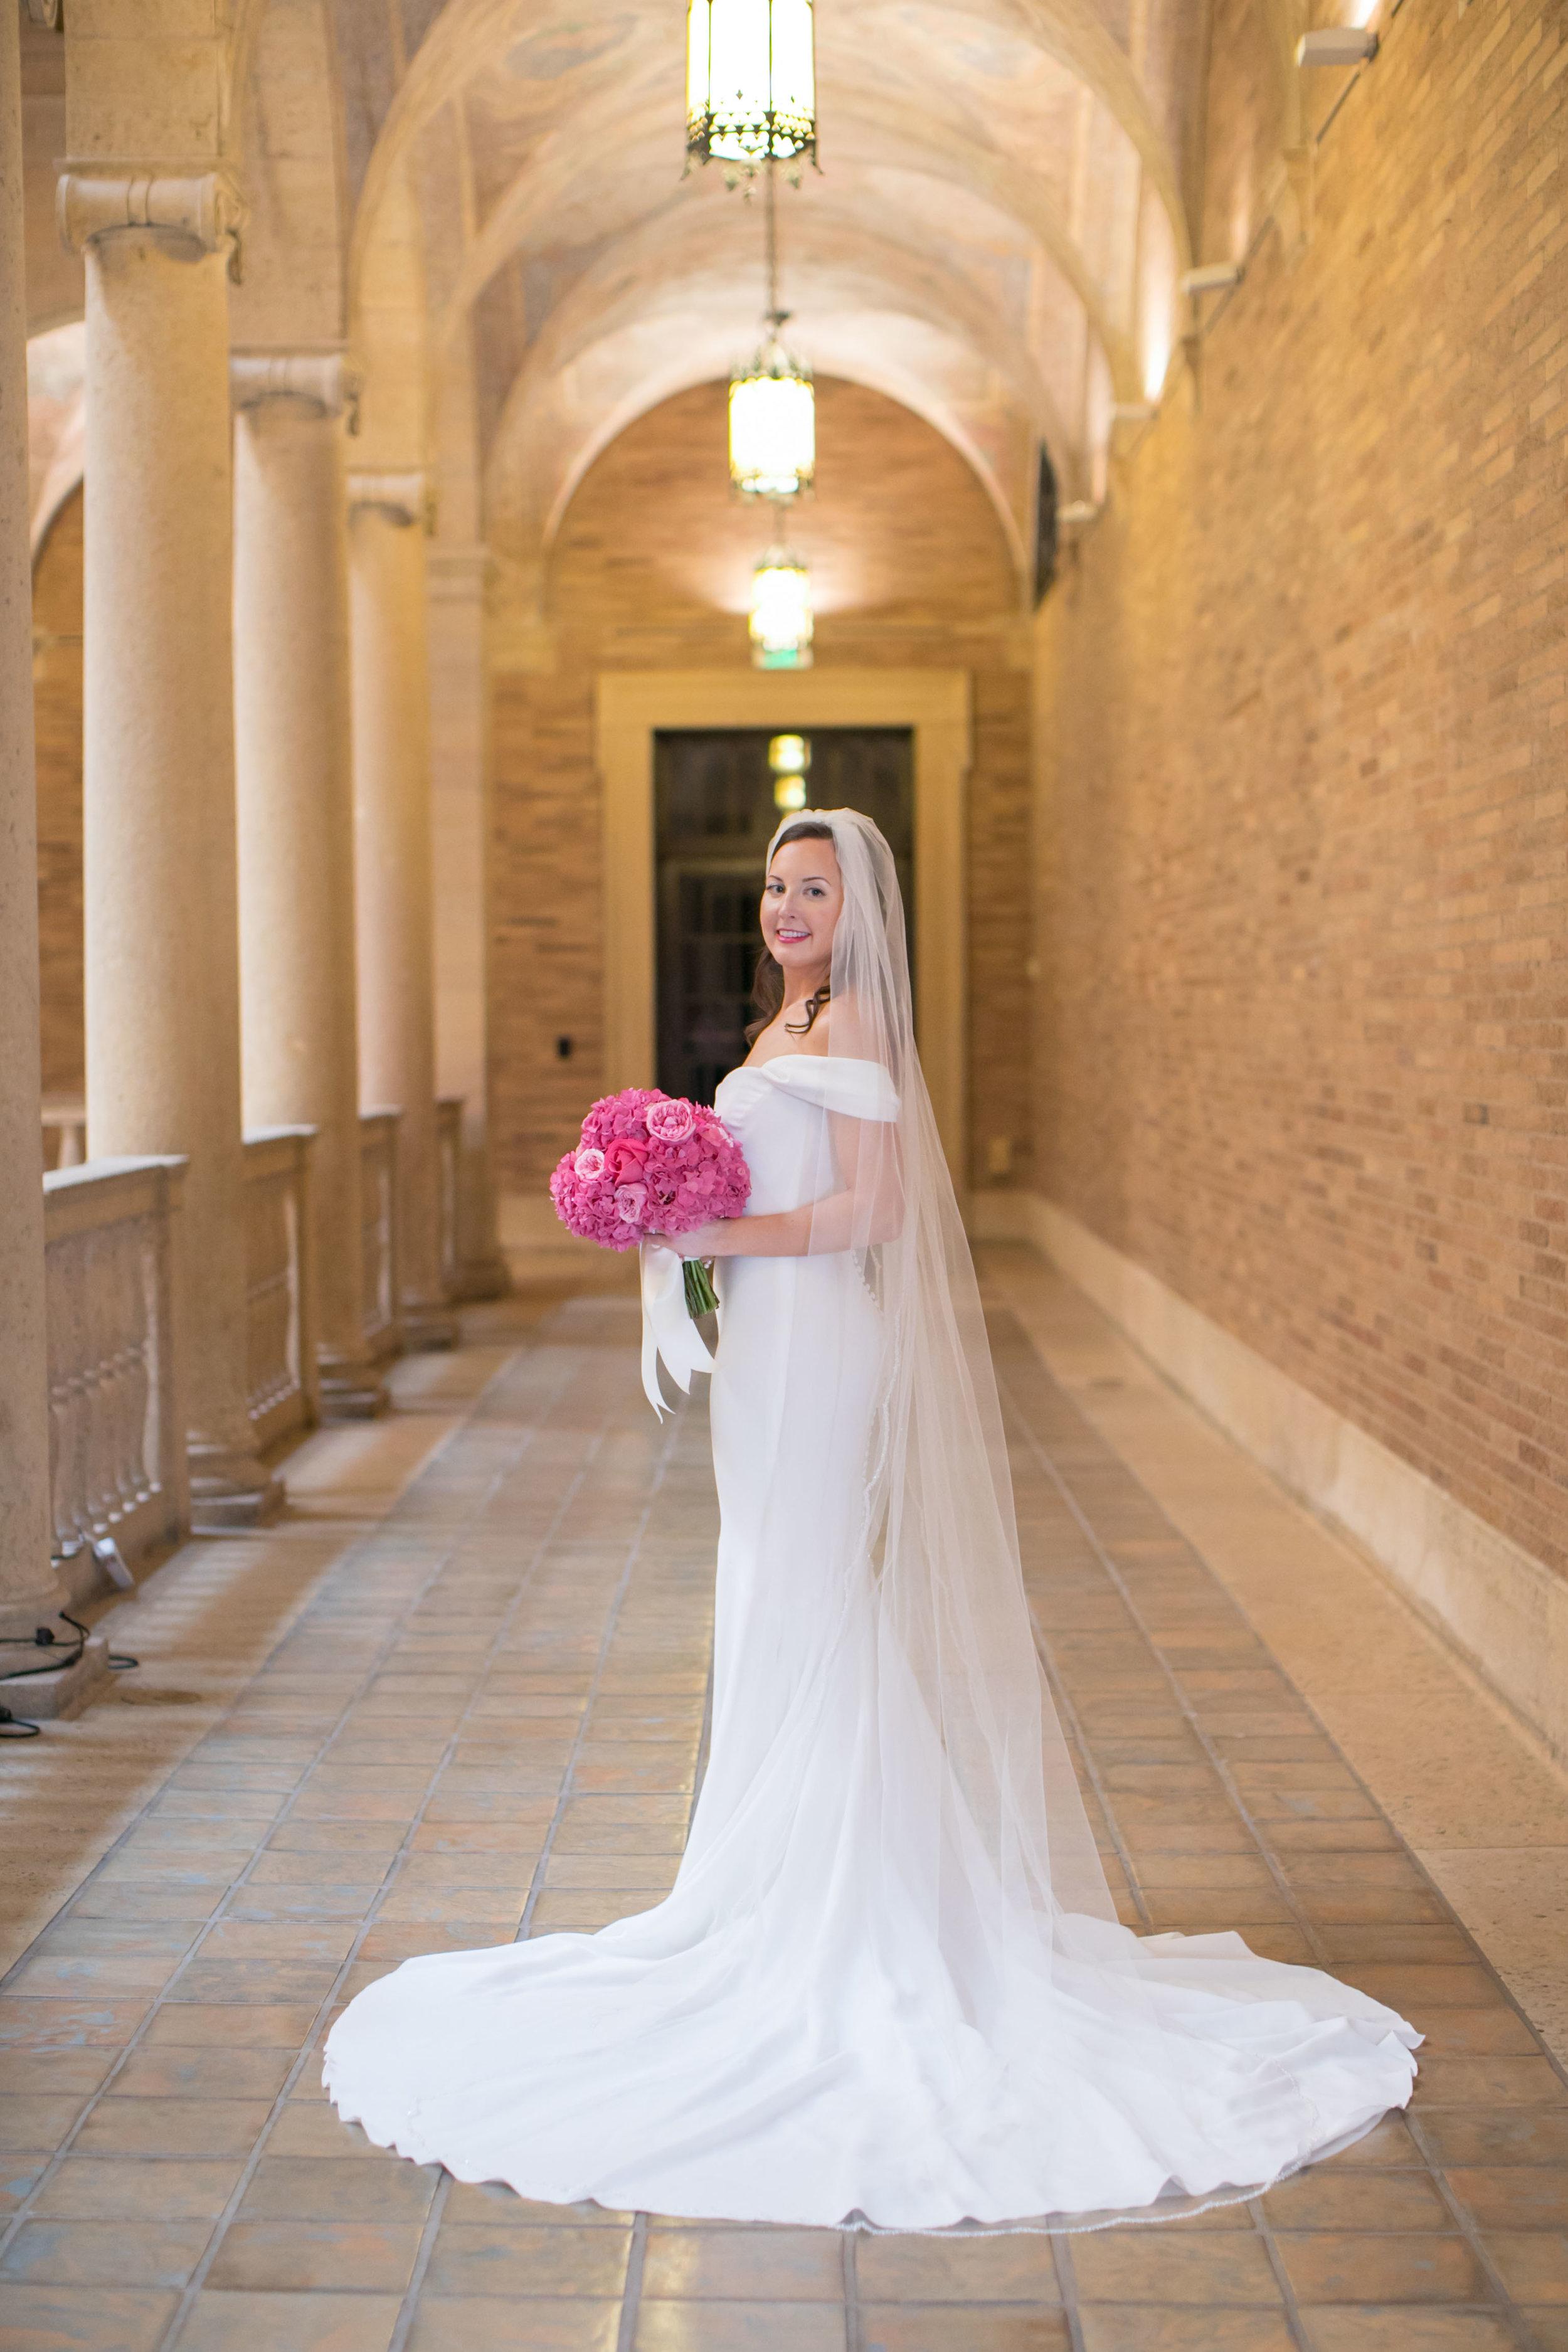 nelson-atkins-wedding-19.jpg